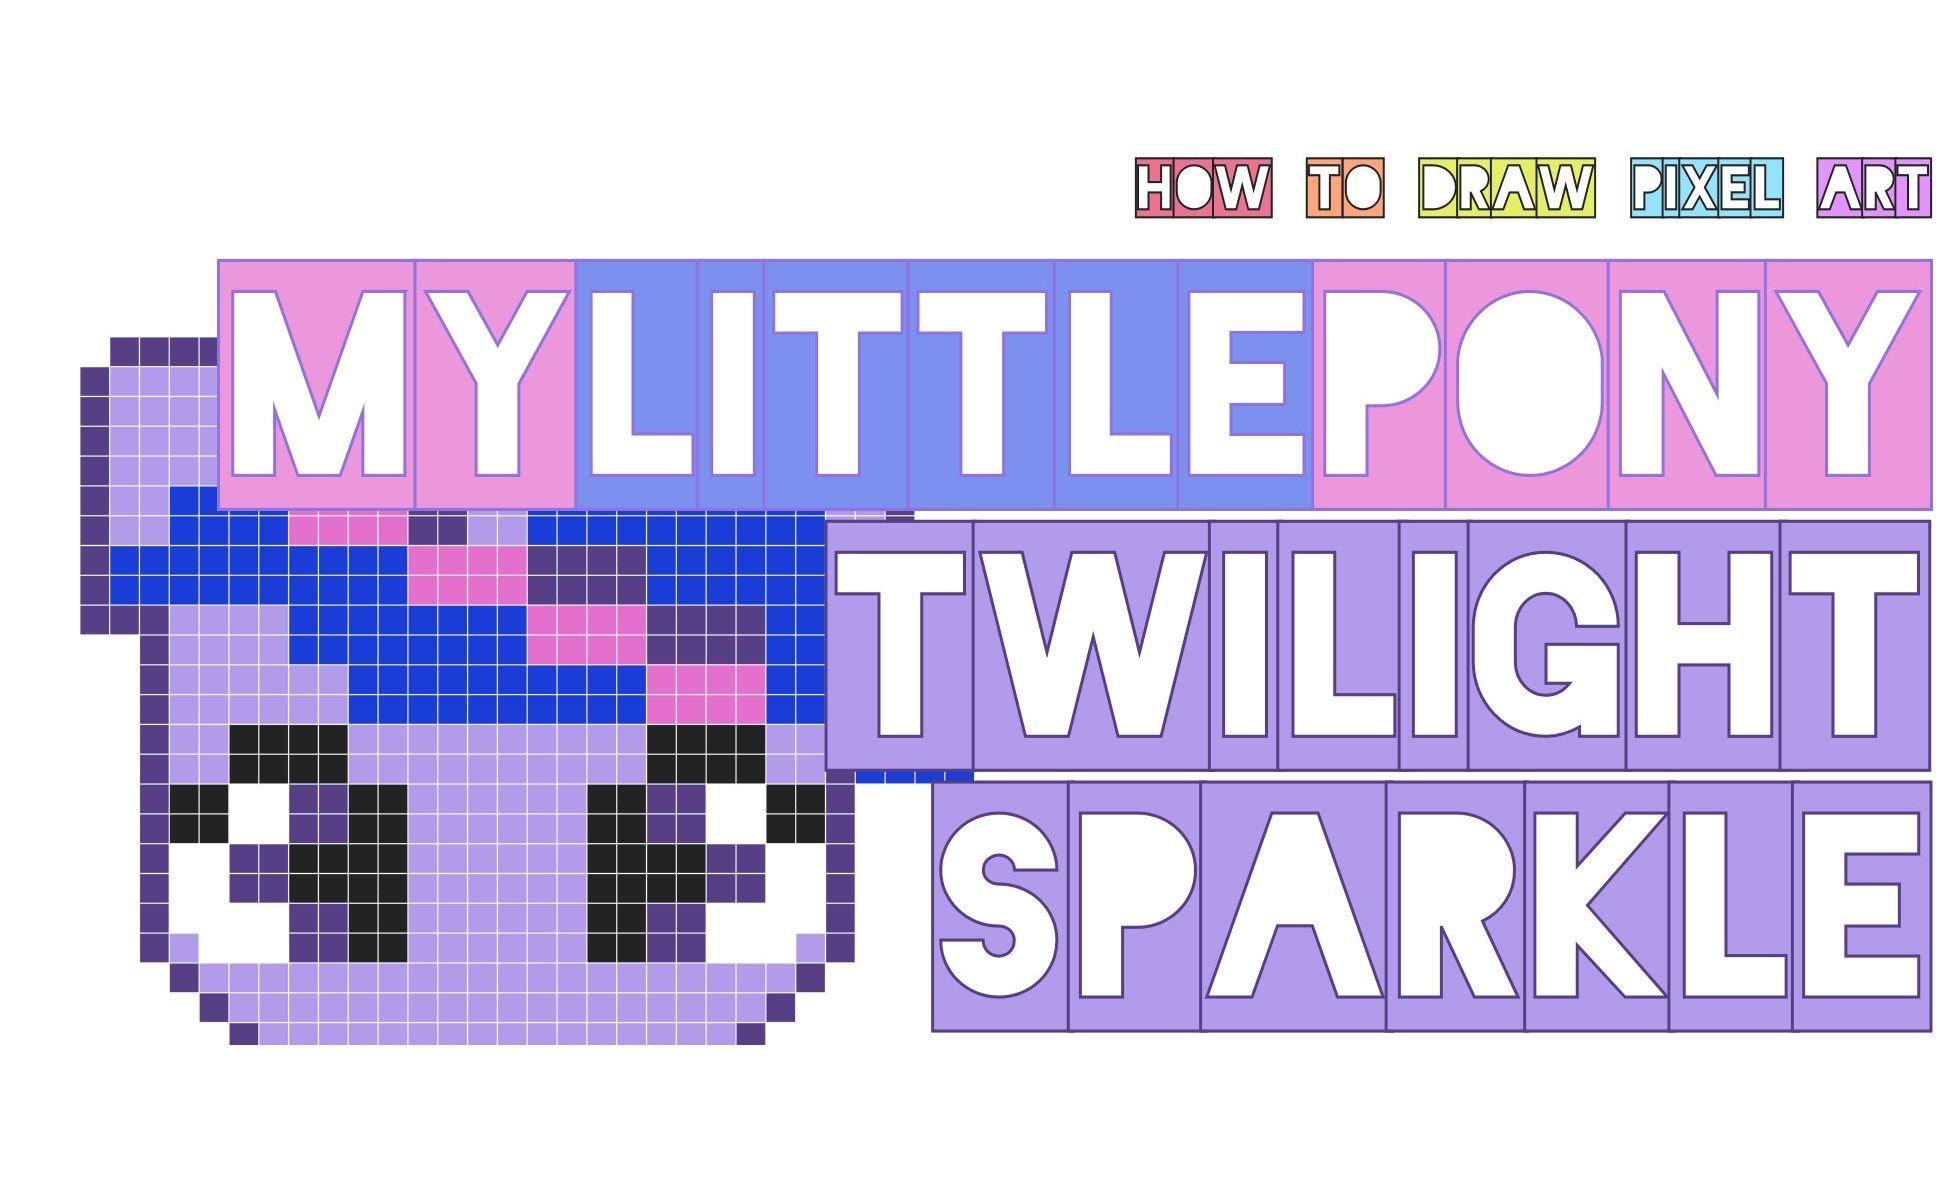 Drawn my little pony small #11